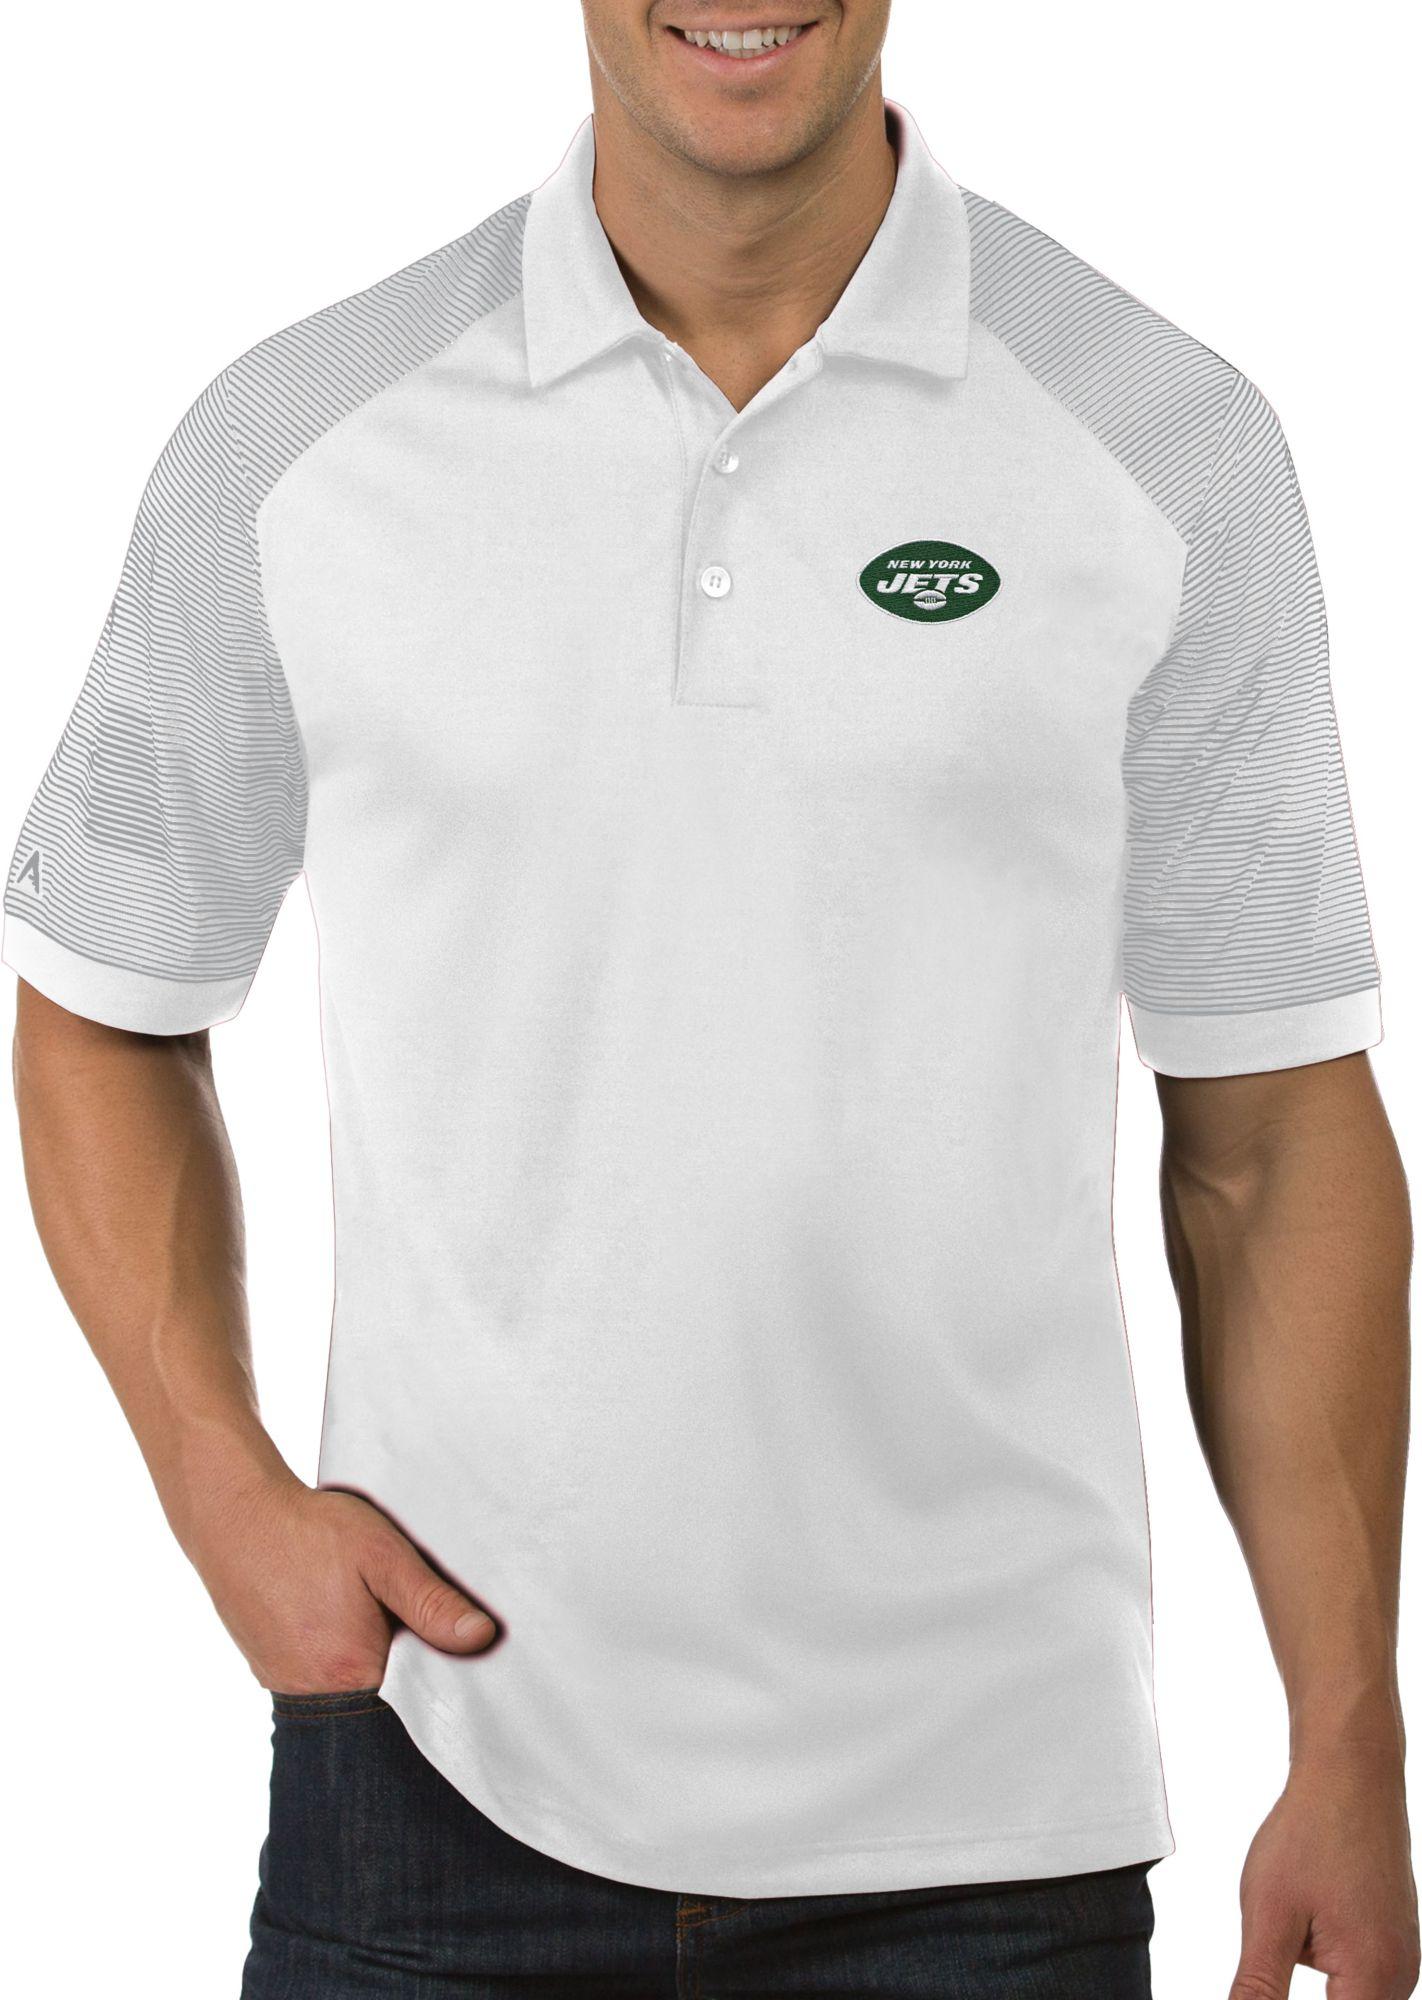 d818f6ed Antigua Men's New York Jets Engage Performance White Polo